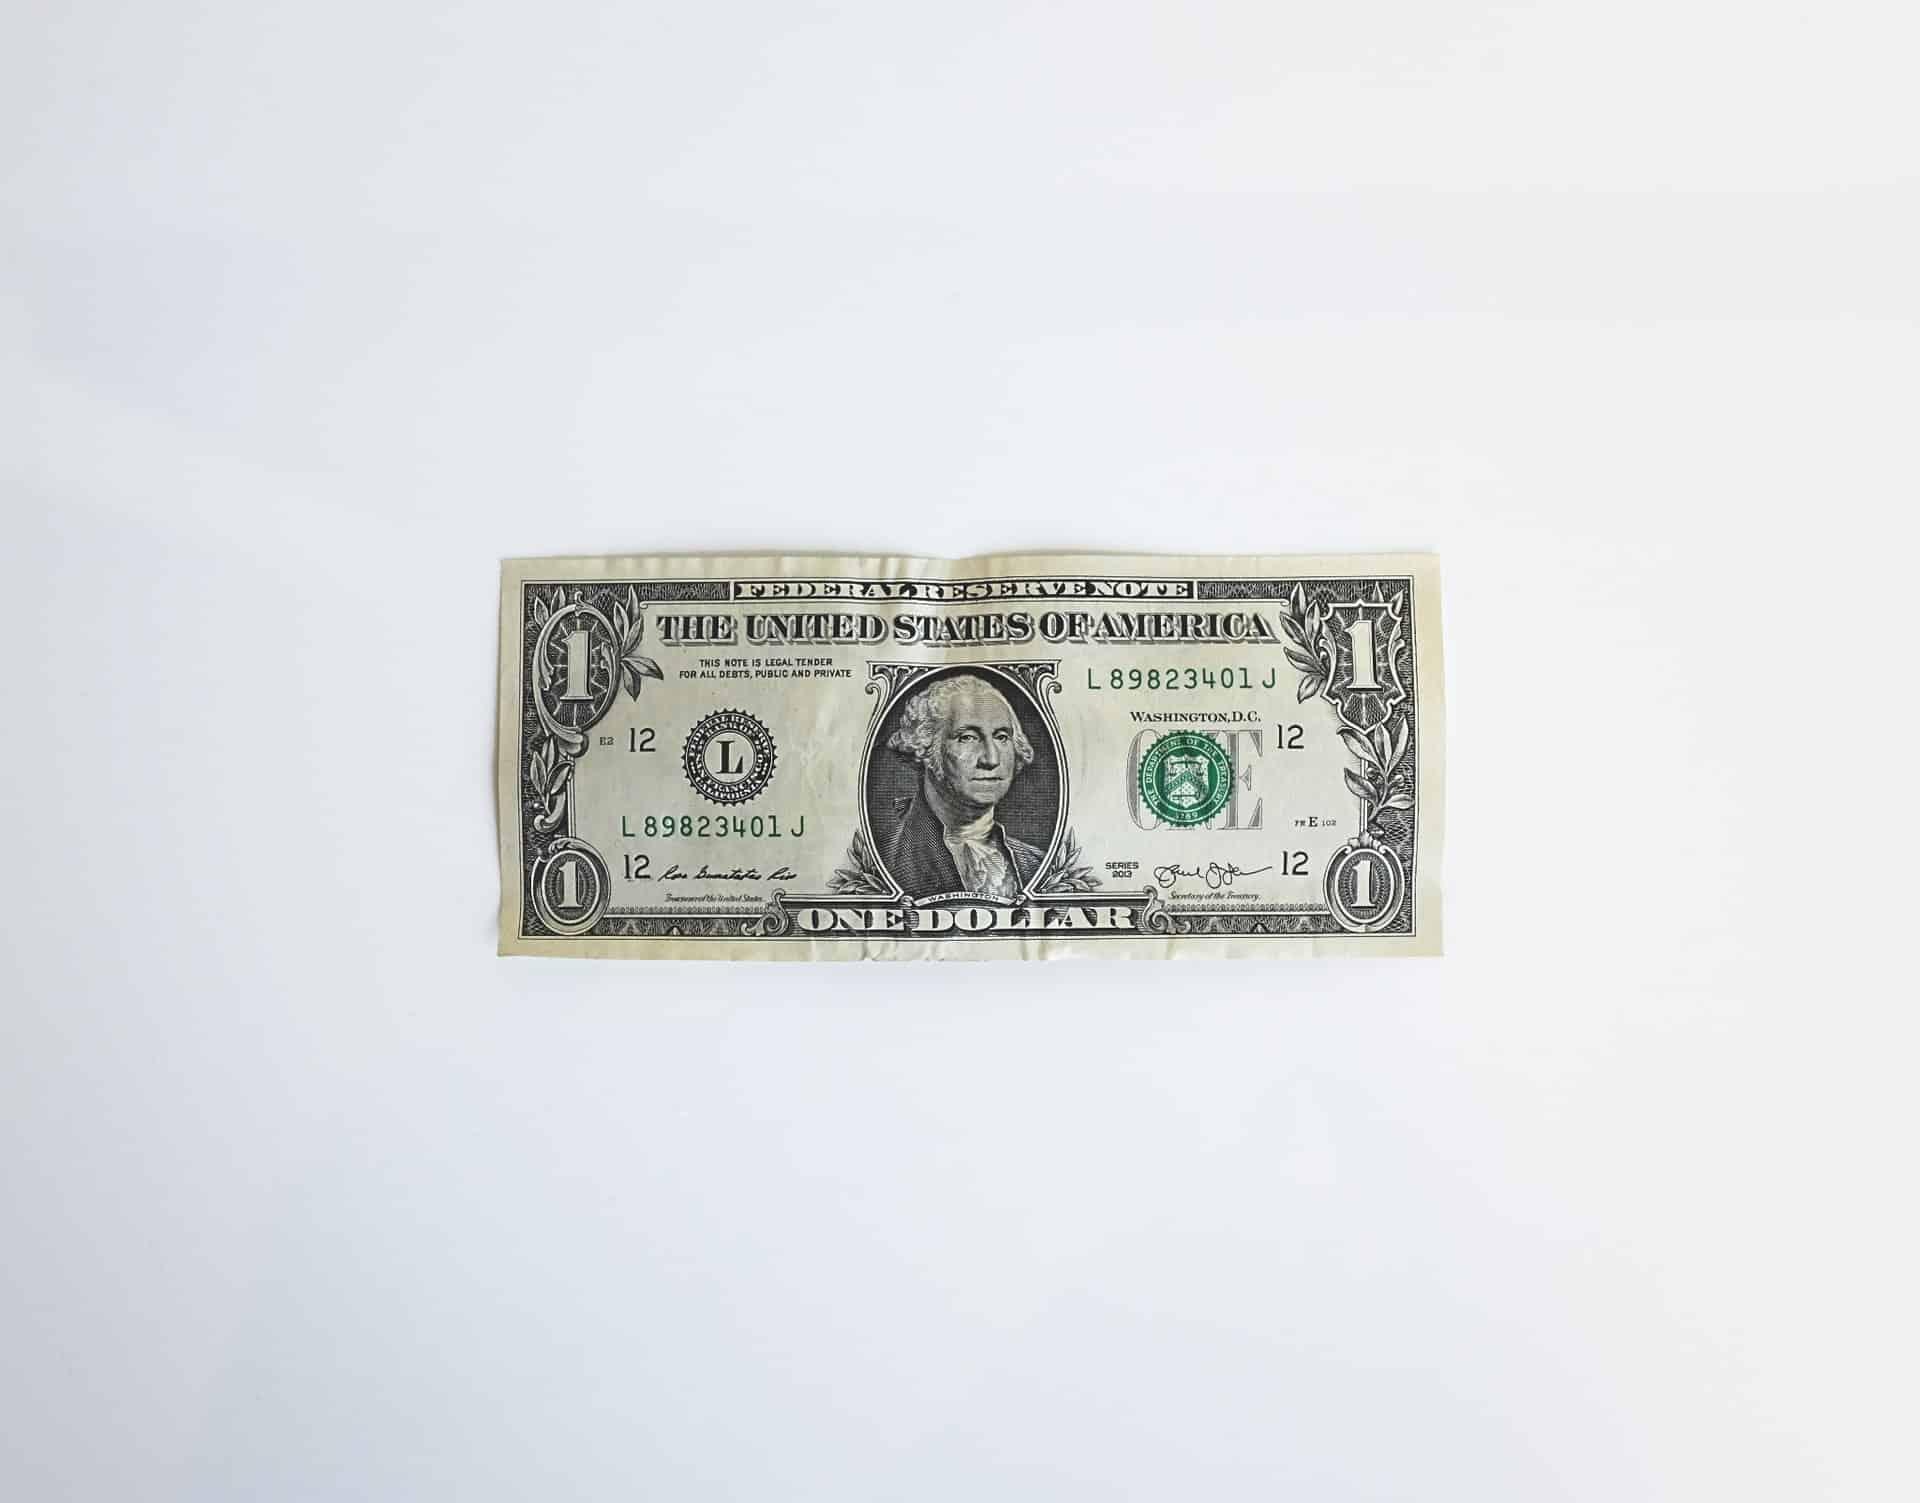 Storefront Lenders Payday Lending Header Image